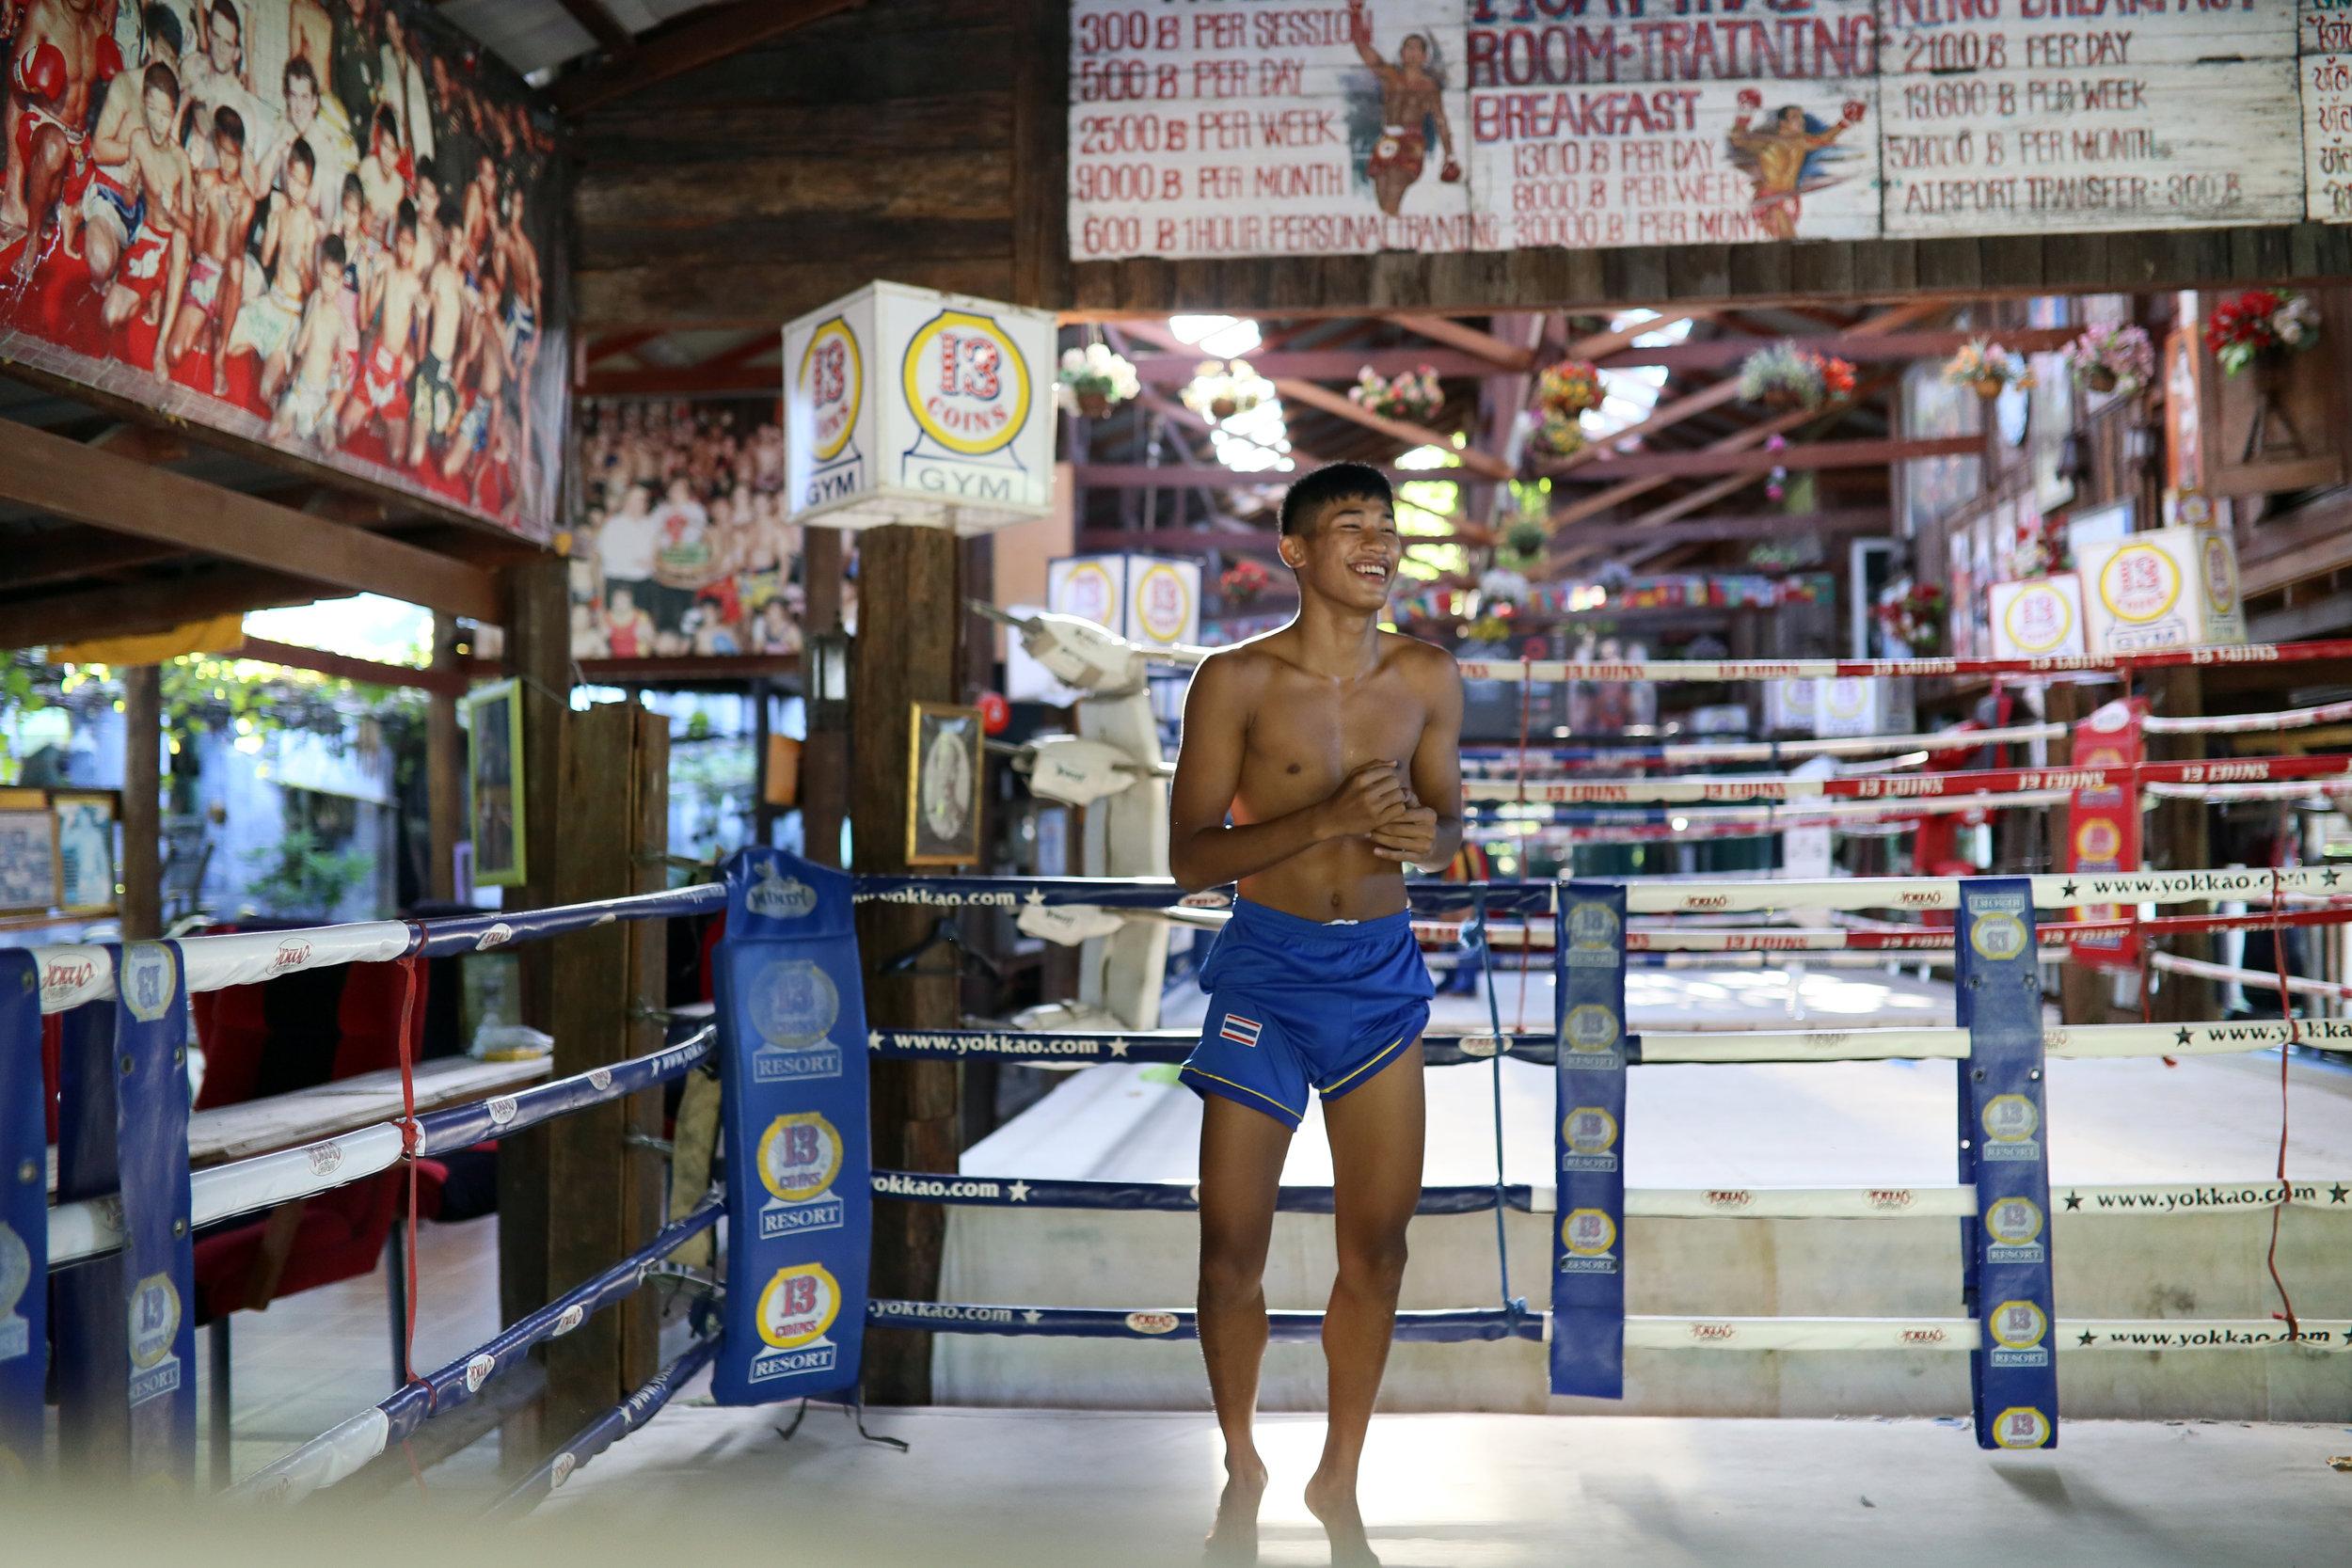 Muay Thai_014.jpg